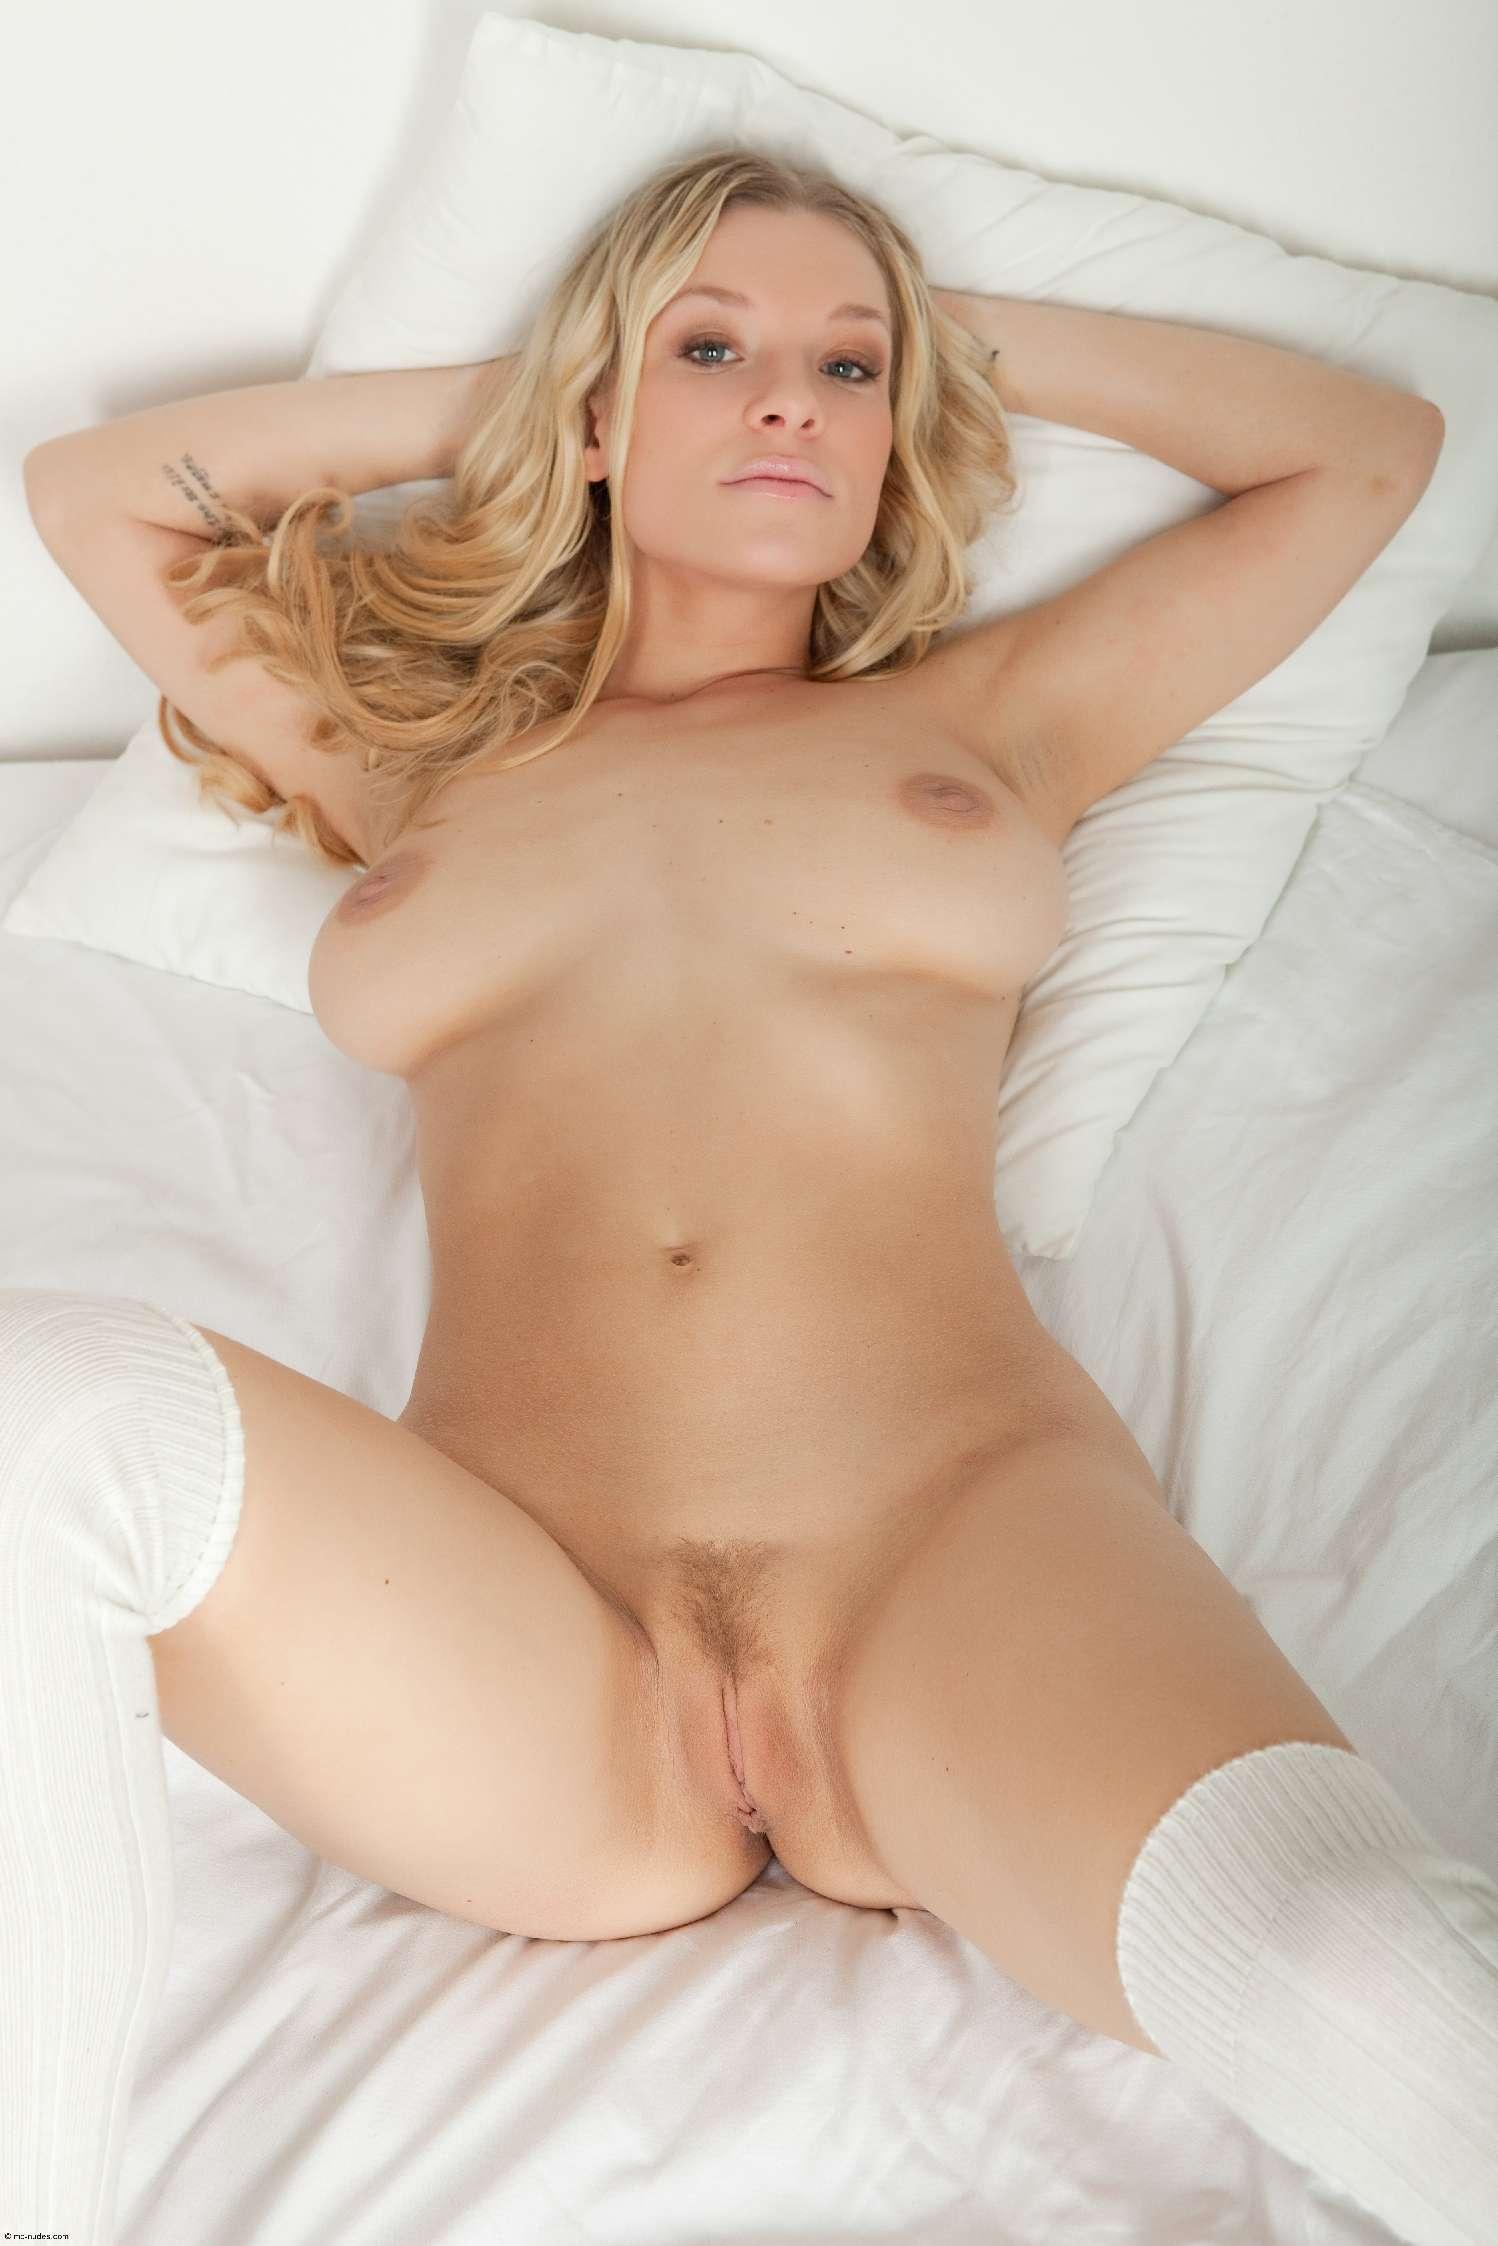 Daisy van heyden naked